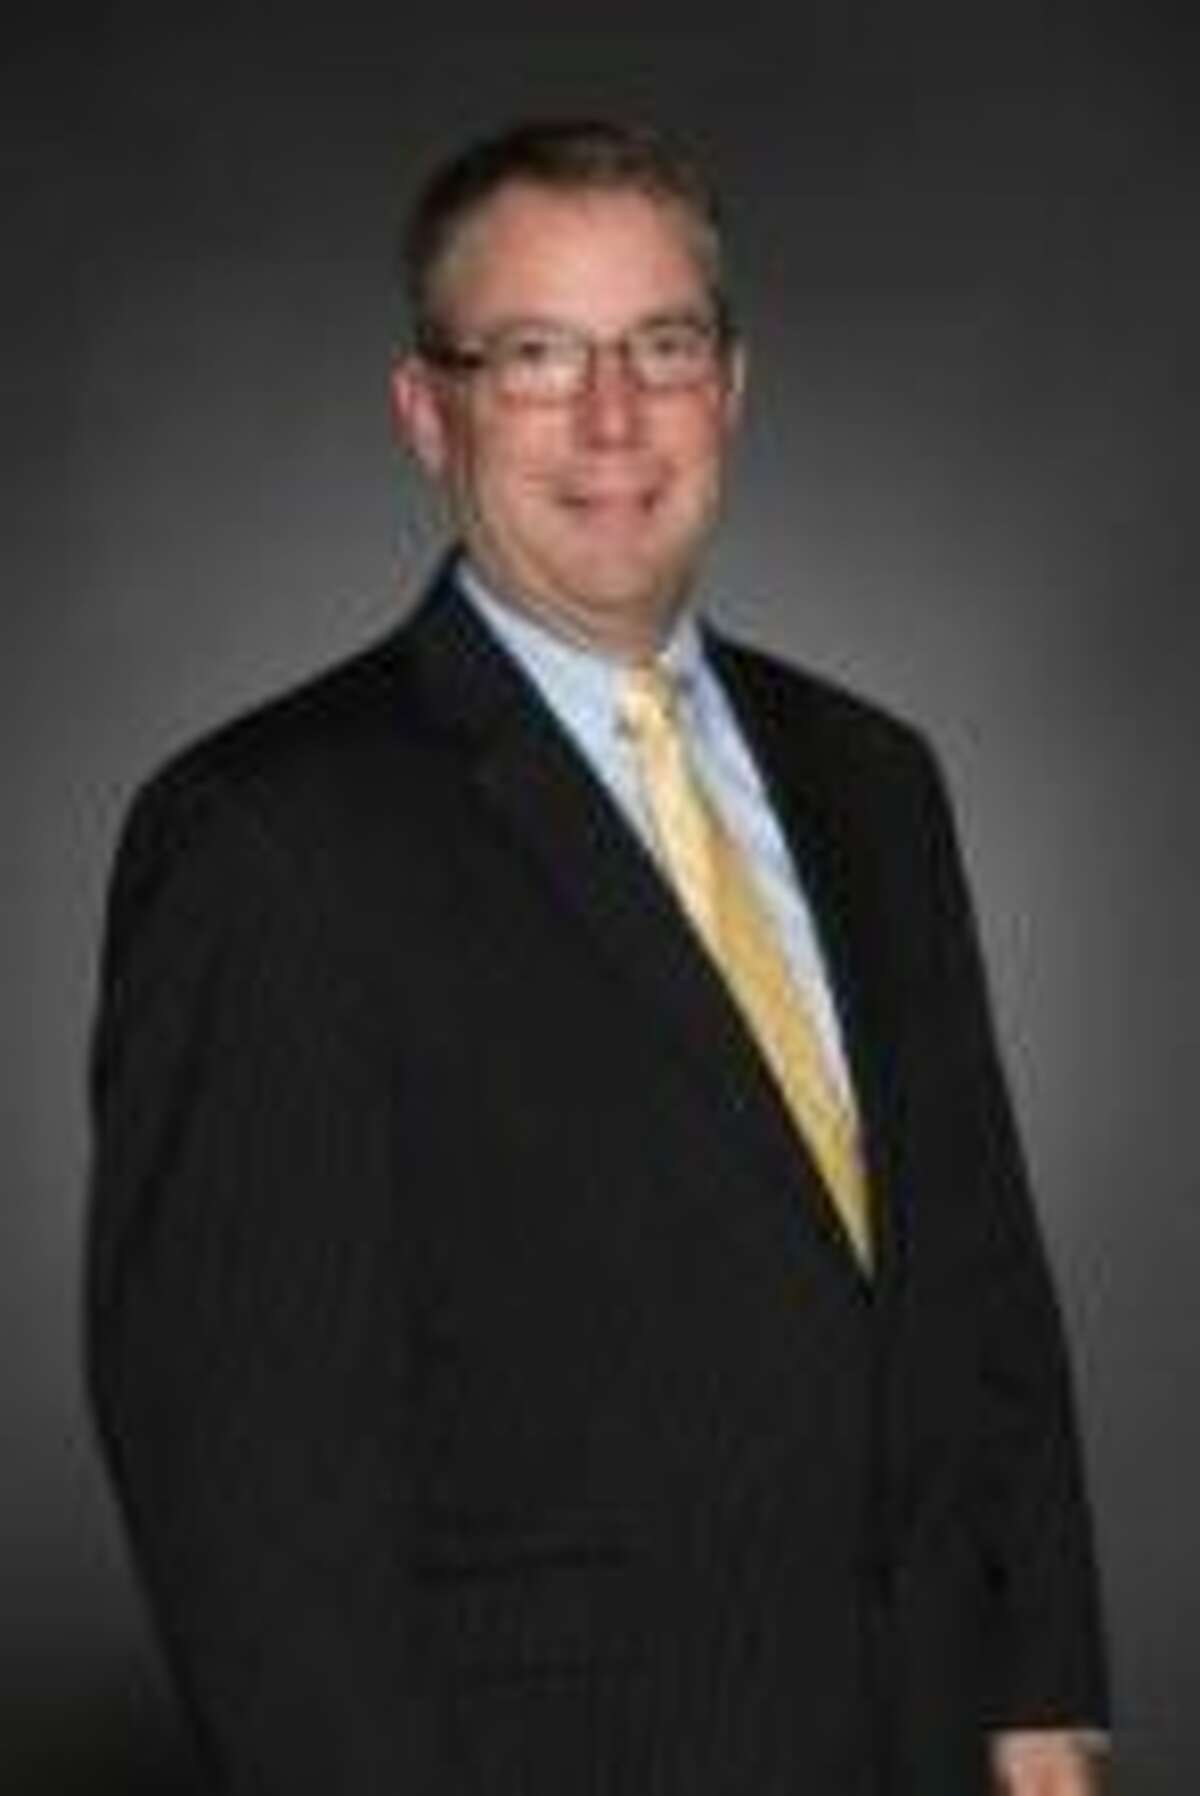 NENYPGA's Doug Evans. (Courtesy of Capital Area Golf)